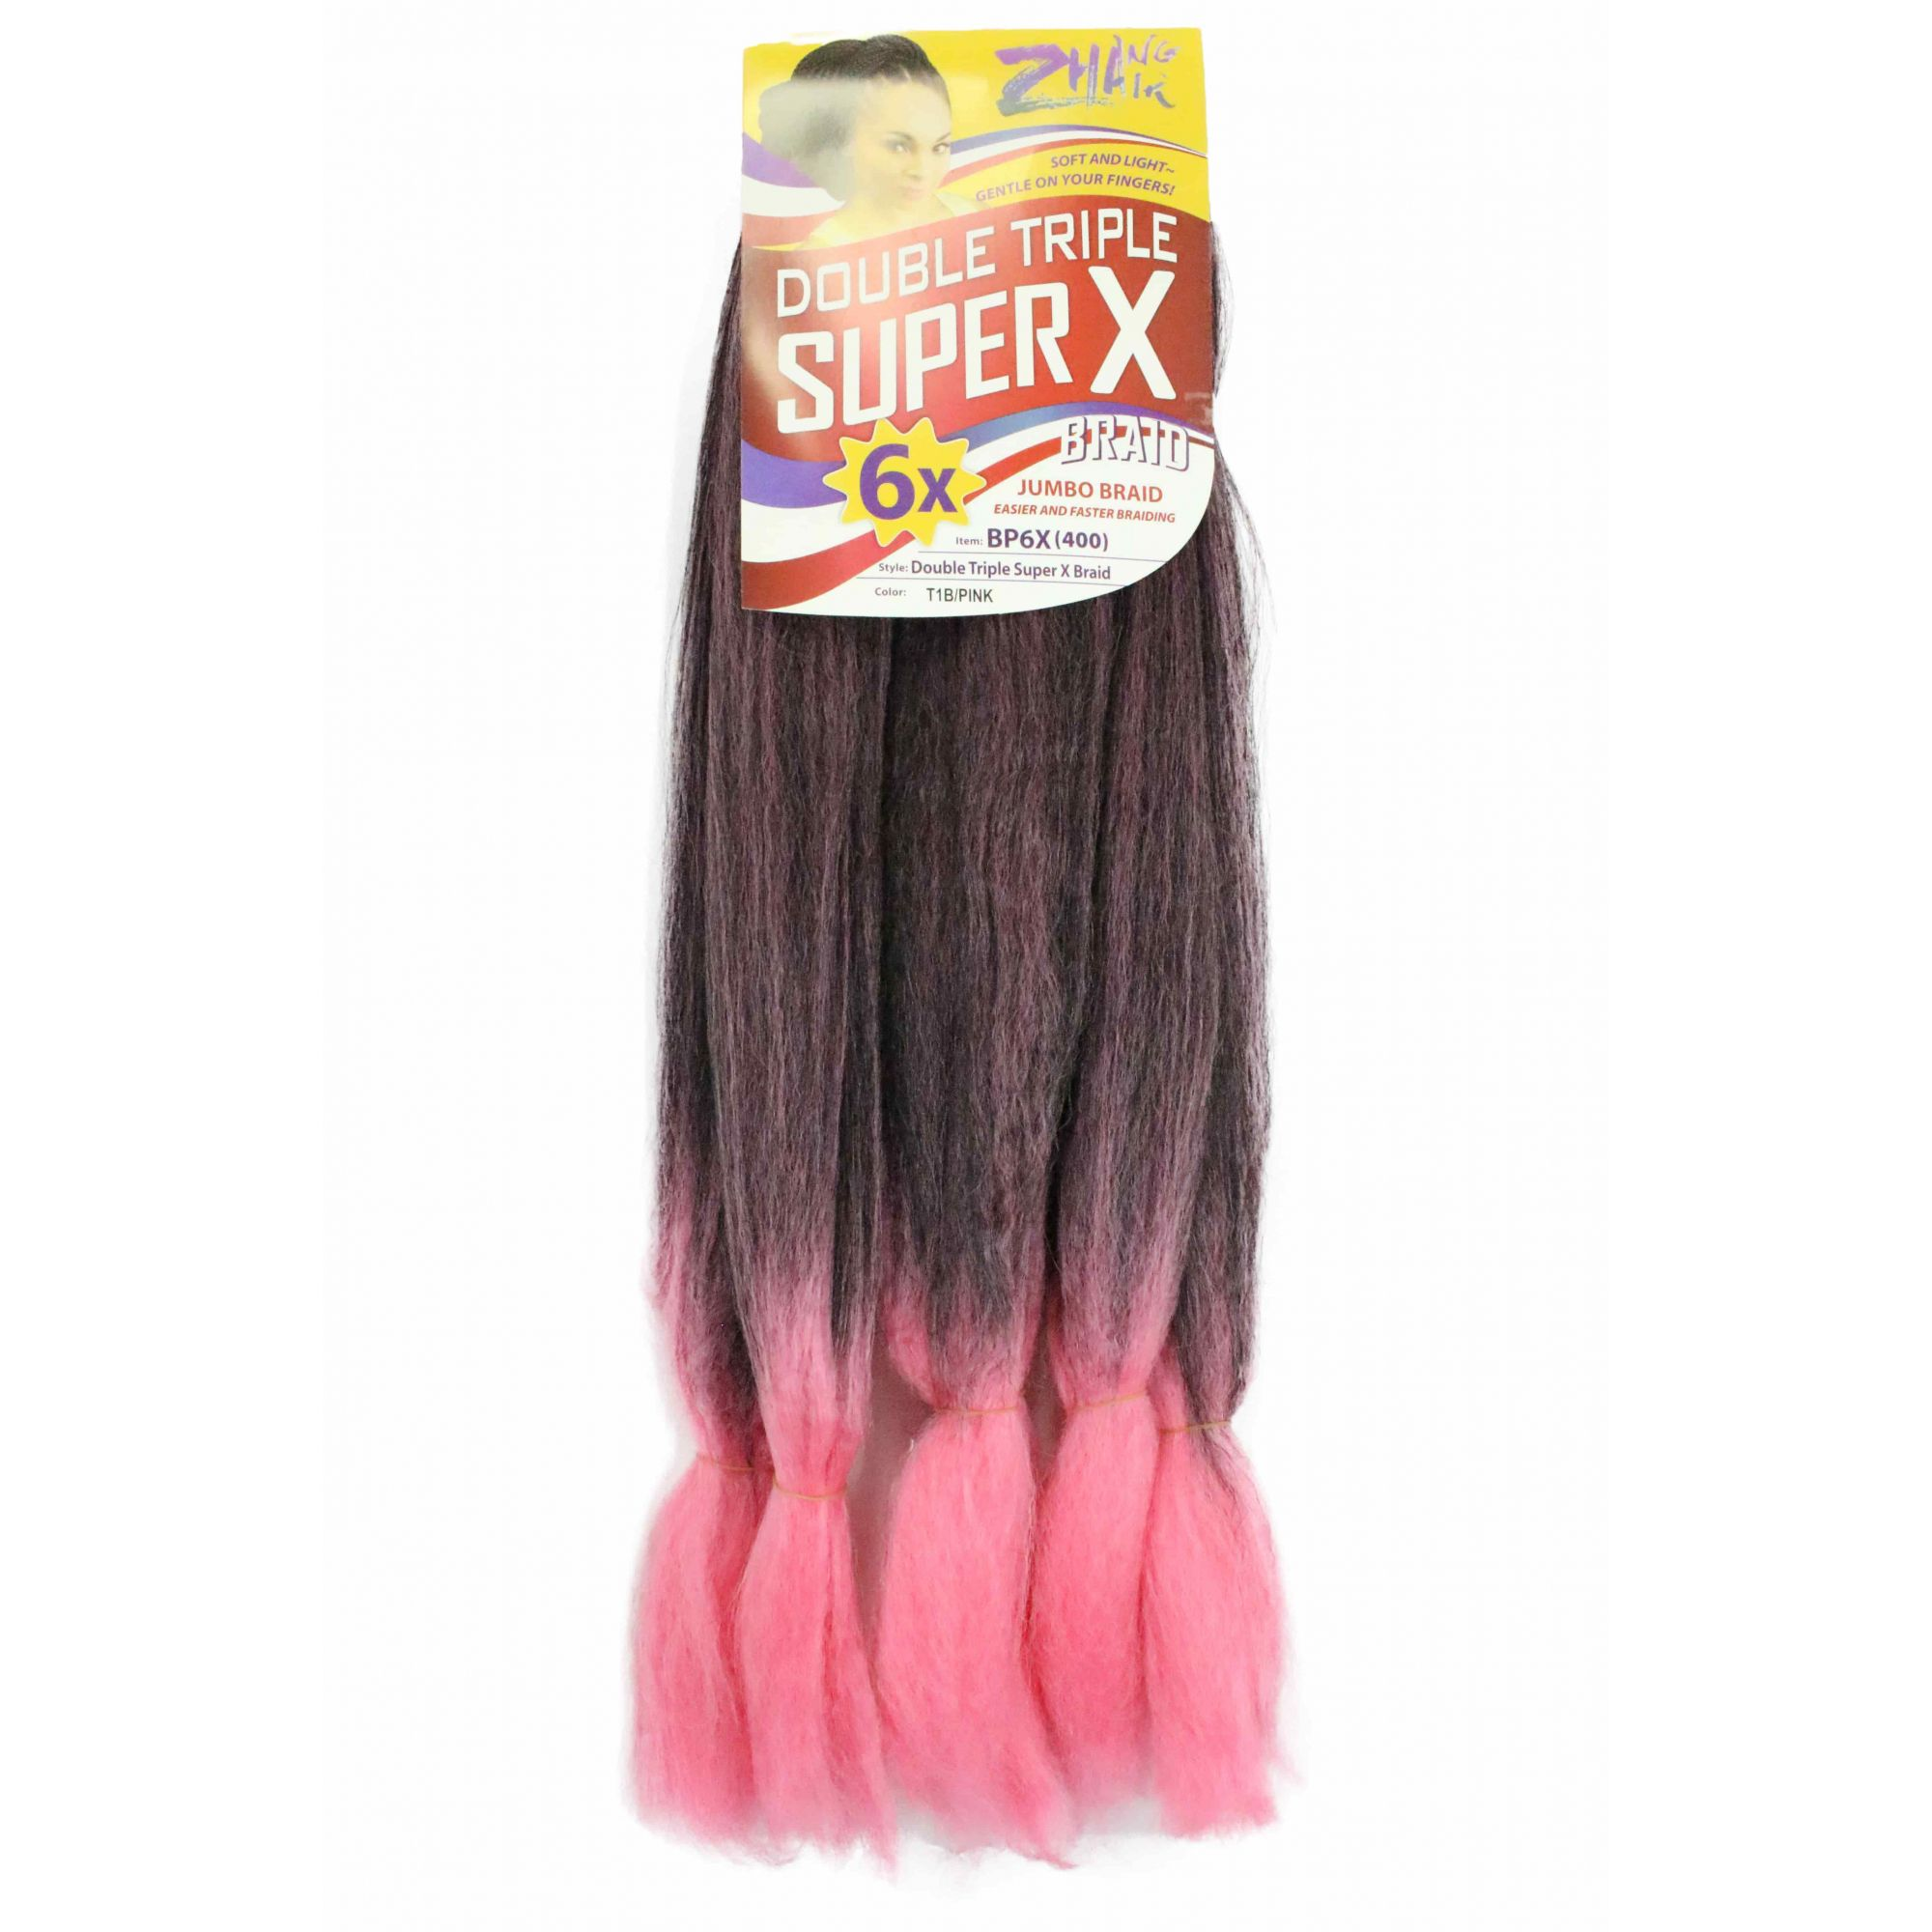 Cabelo Sintético - Zhang hair jumbo - Super X (400g) - Cor: Preto com Rosa (T1B/Pink)